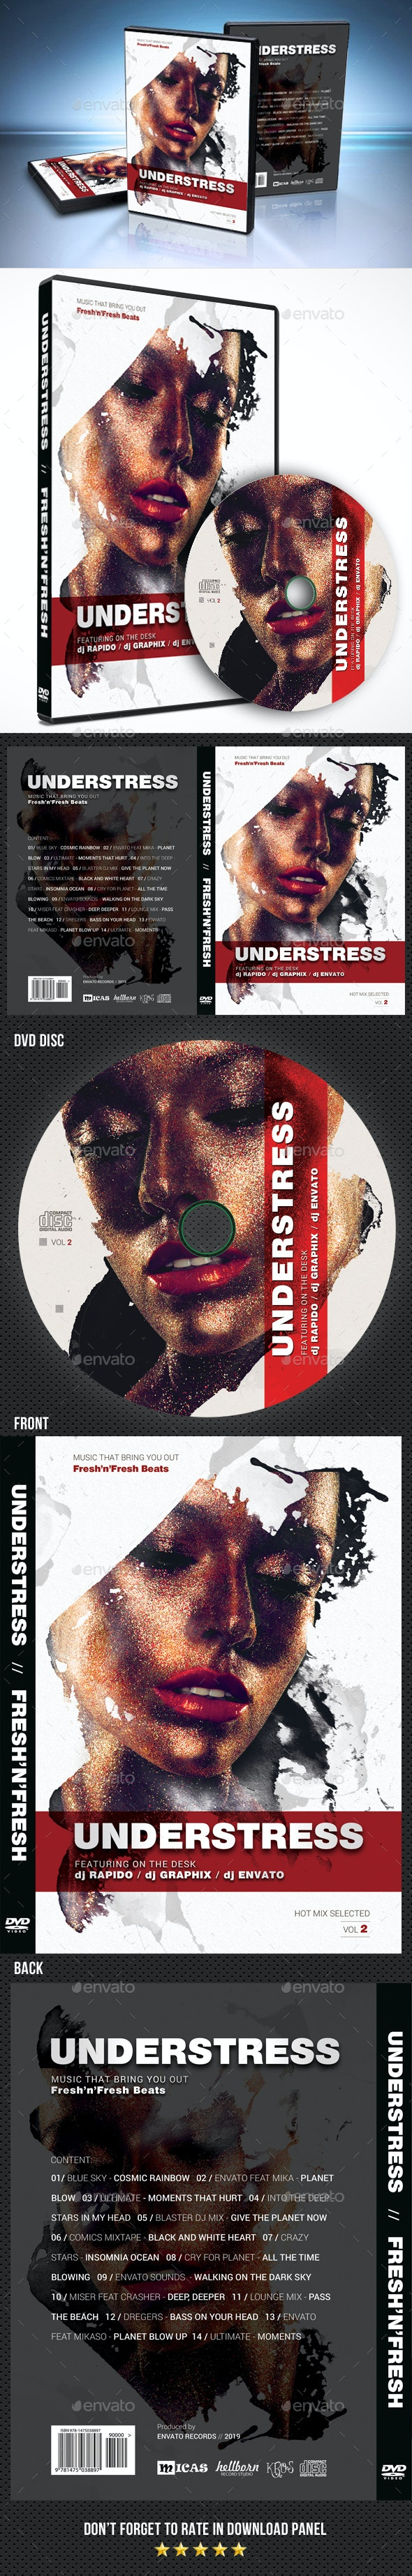 Understress DVD Cover - CD & DVD Artwork Print Templates